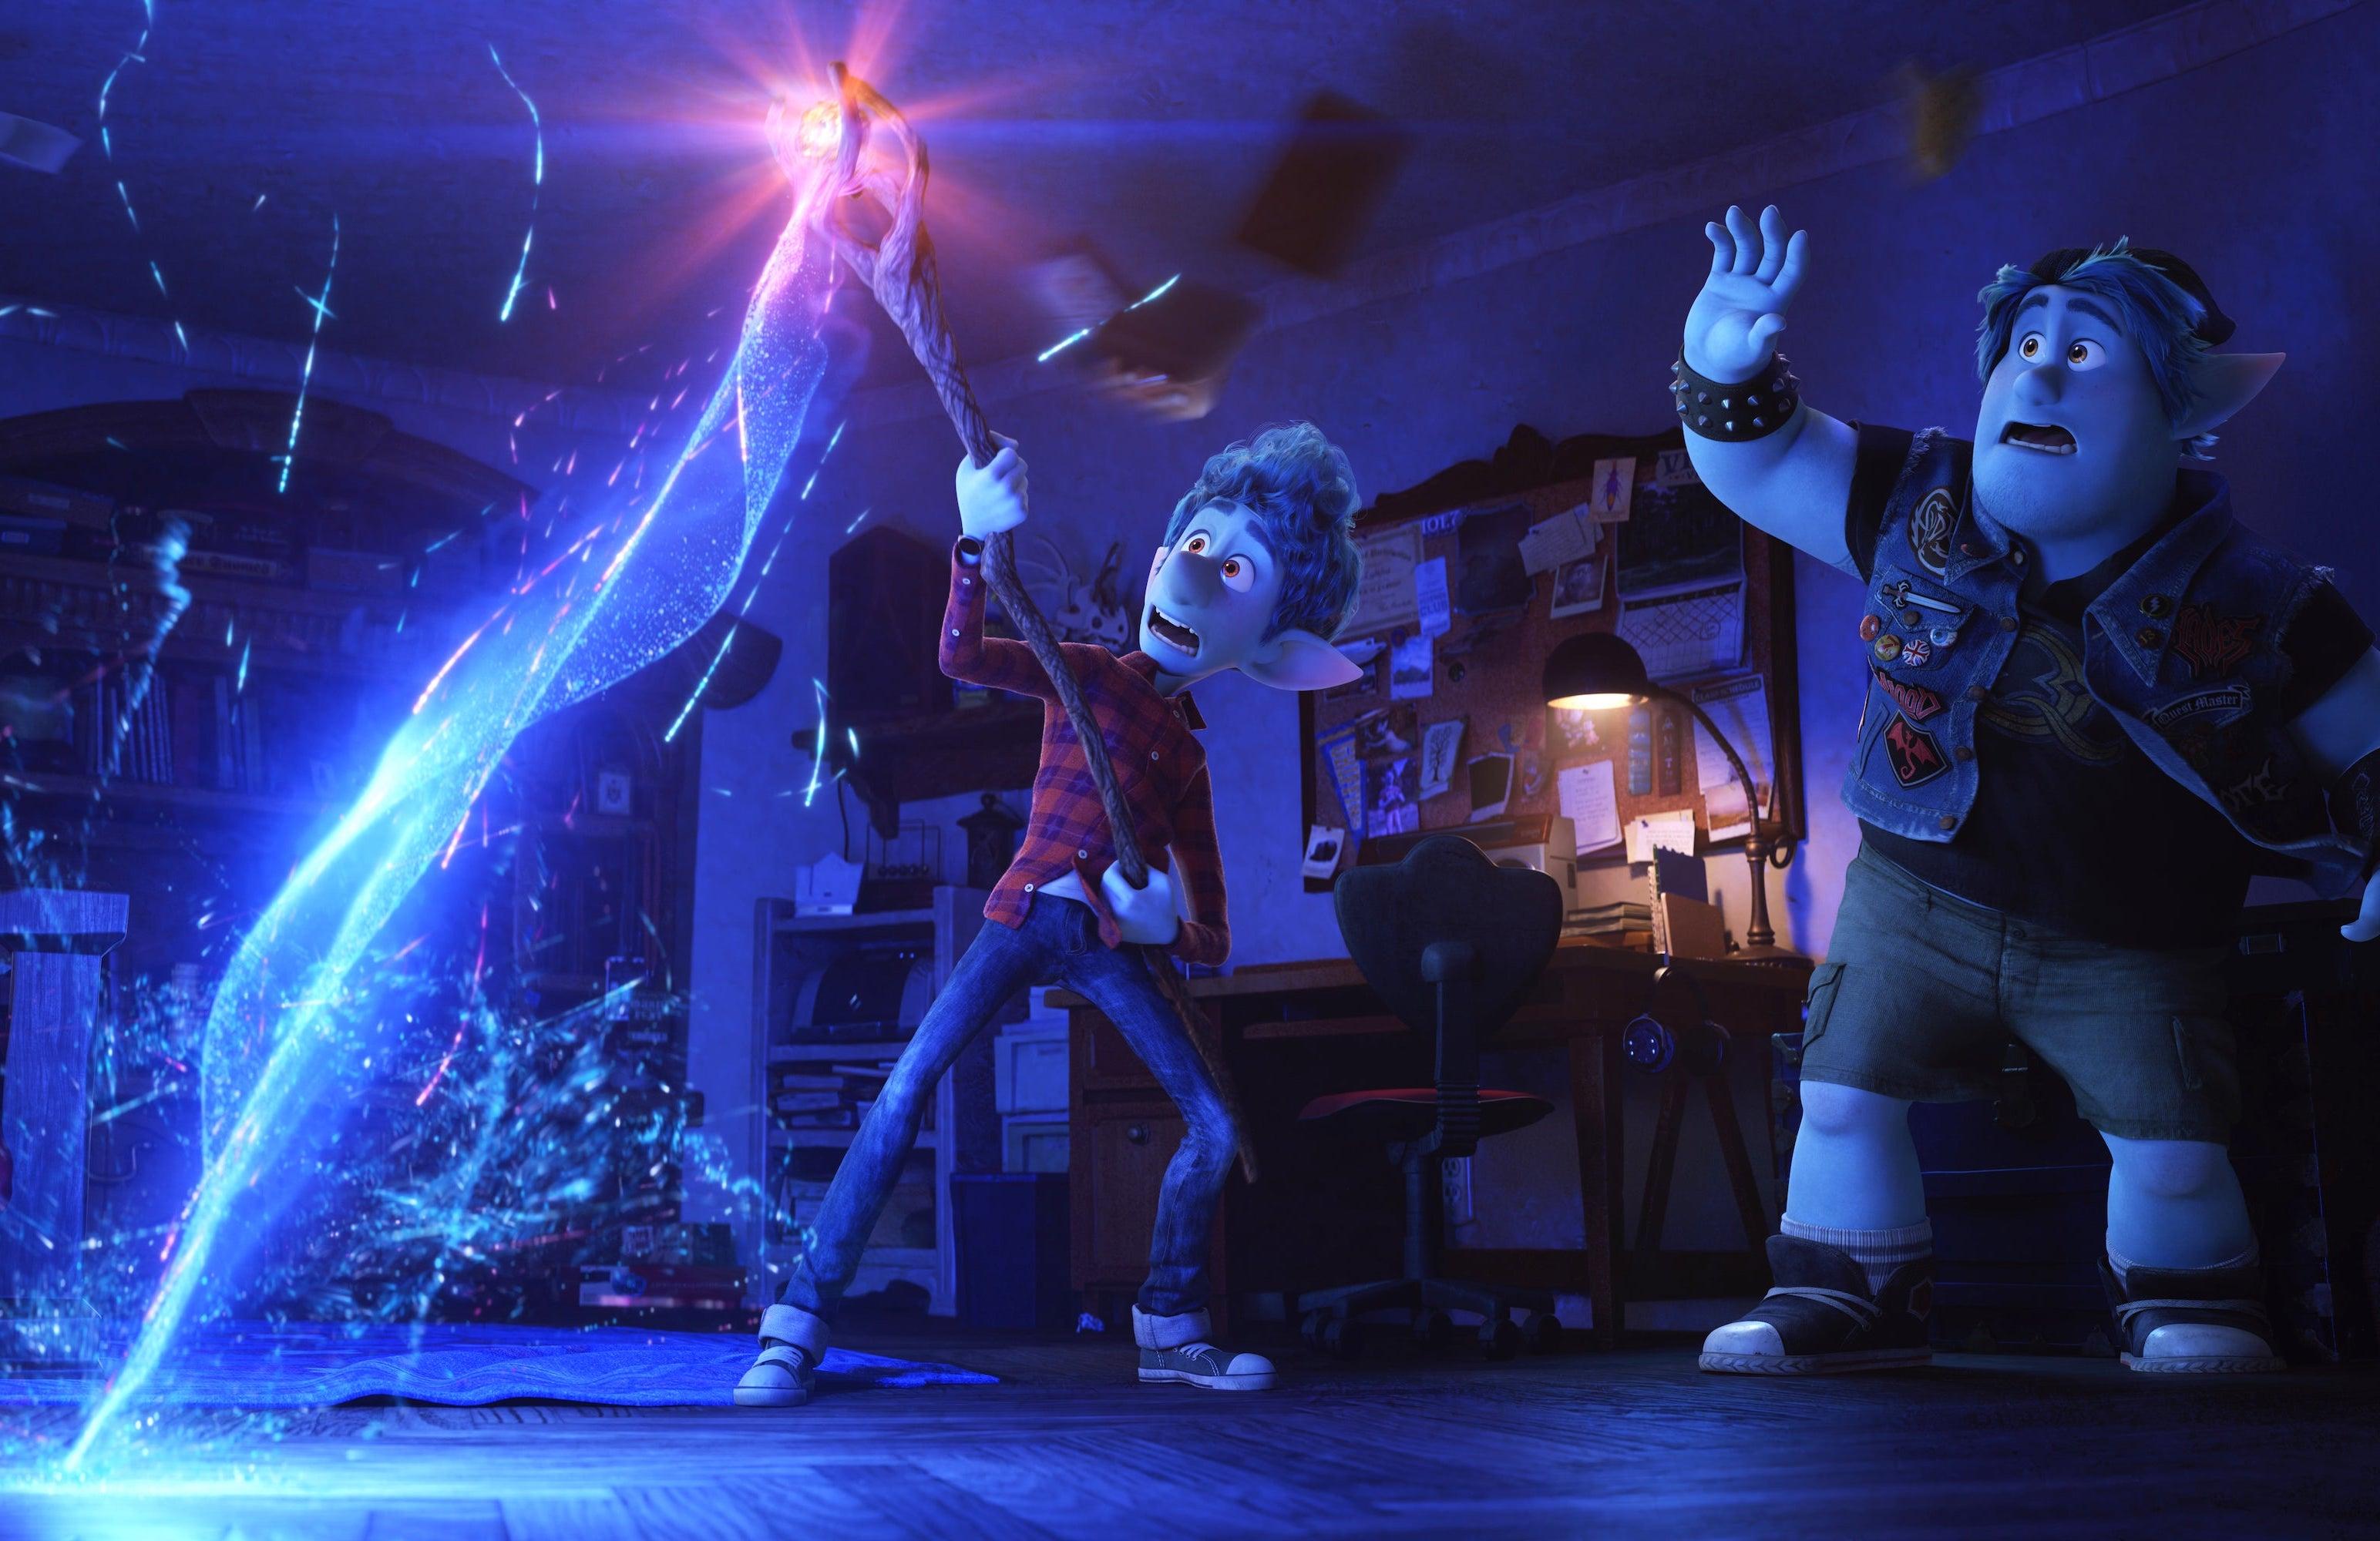 Pixar's 'Onward' & Hollywood's Battle Against Originality | Observer